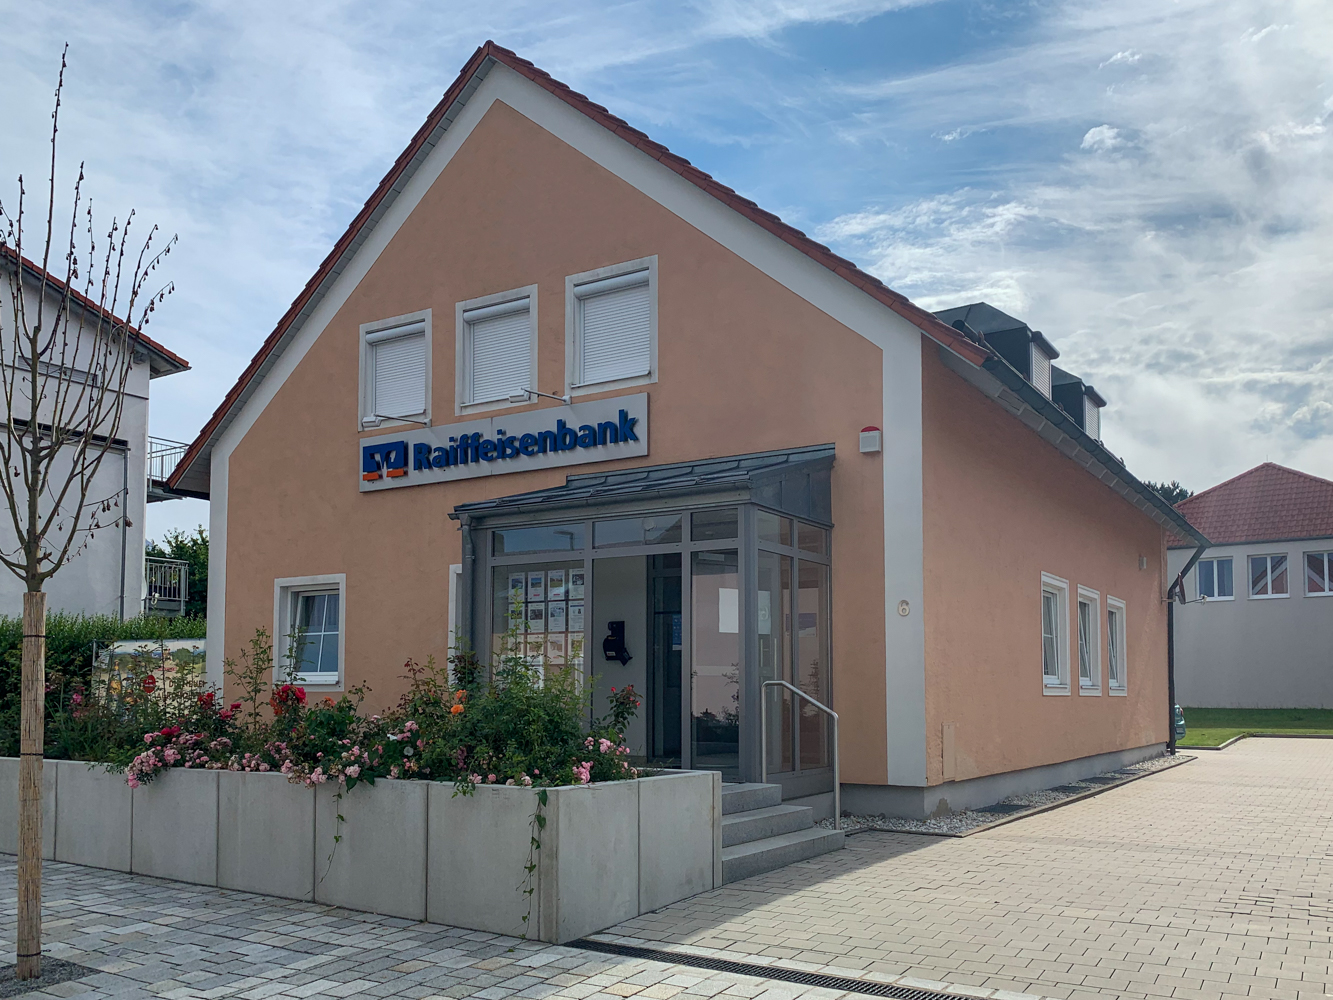 Raiffeisenbank i. Lkrs. Passau-Nord eG, Raiffeisenbank i. Lkrs. Passau-Nord eG, Tittlinger Str. 6, 94154, Neukirchen v. Wald